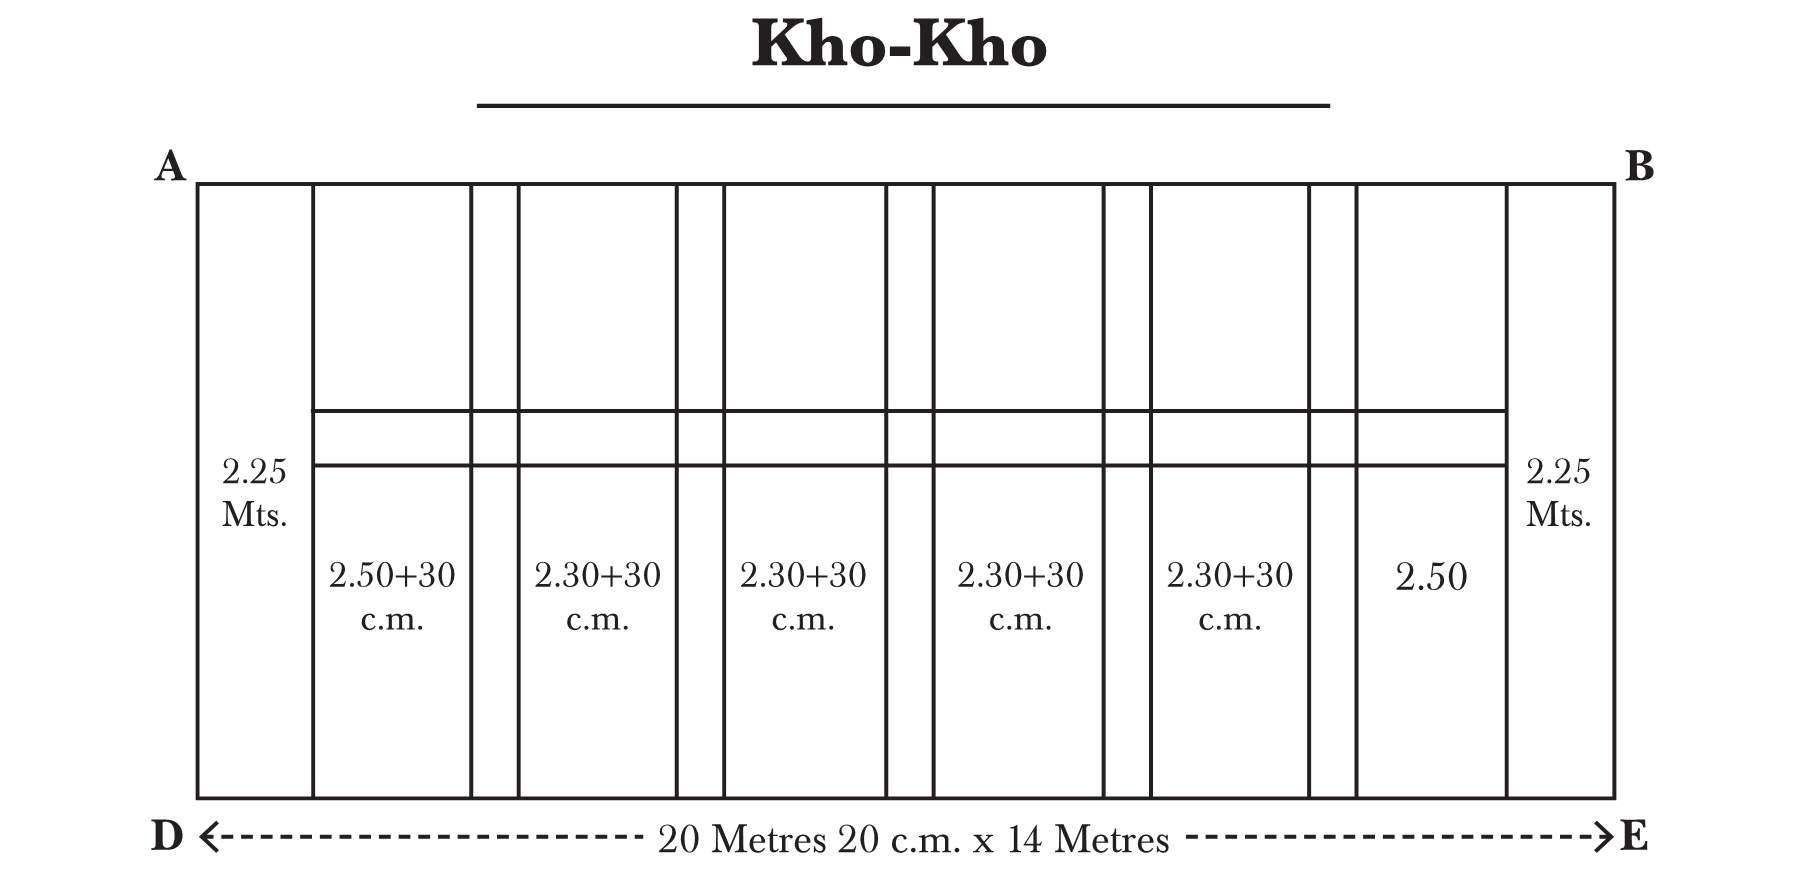 Kho Kho Game PNG - 42951